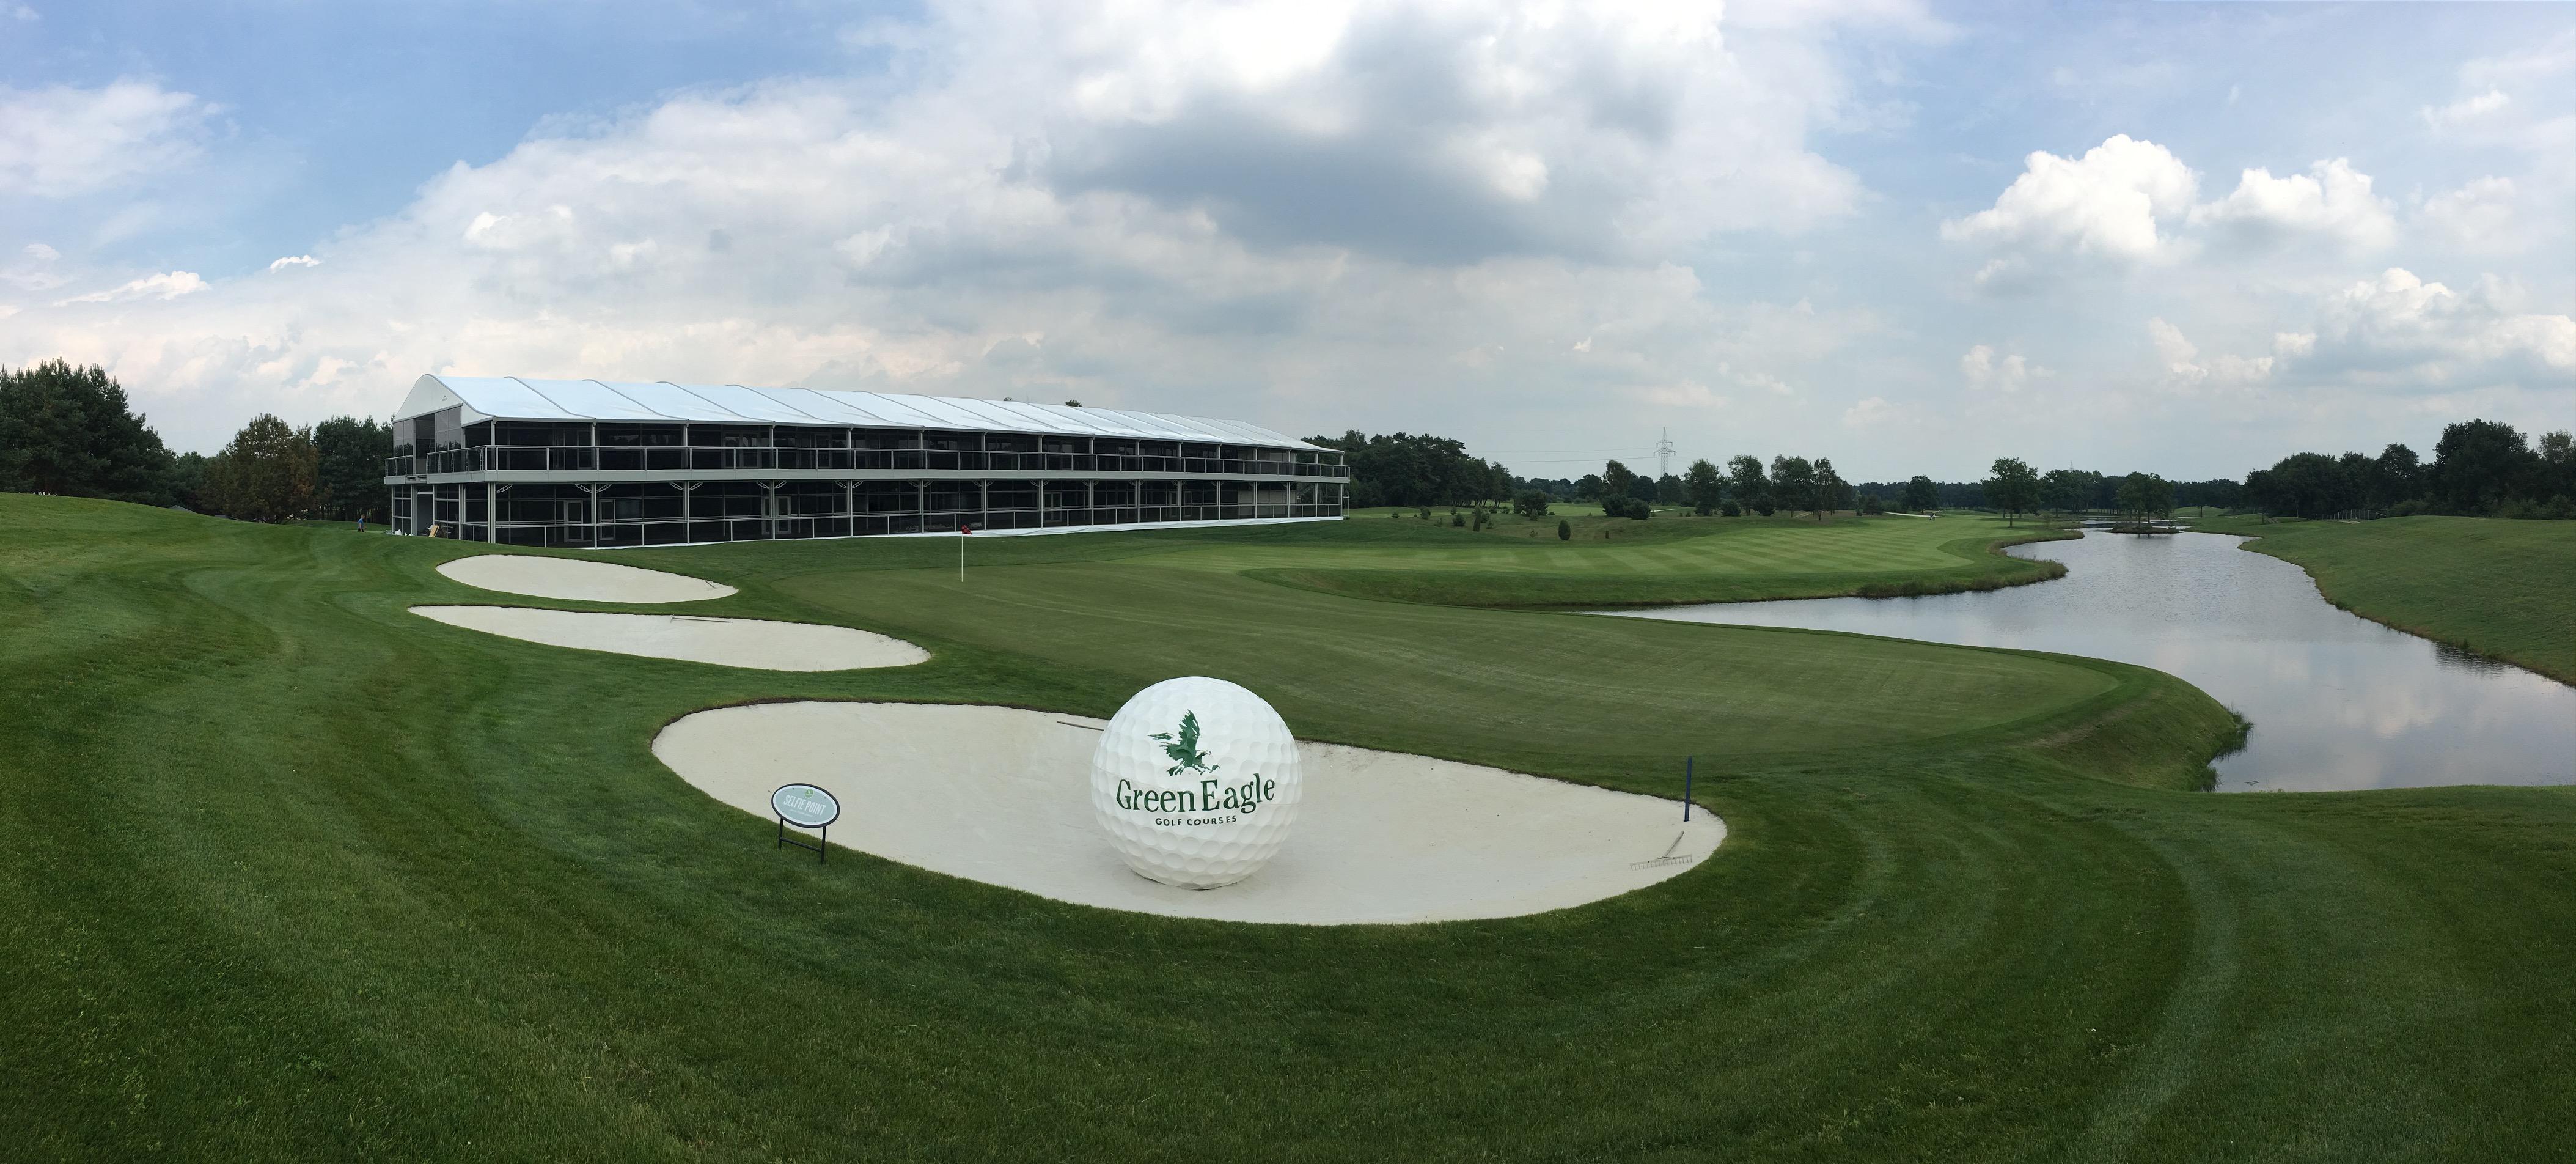 Green Eagle Golf CoursesIMG_9196 - Green Eagle Golf Courses